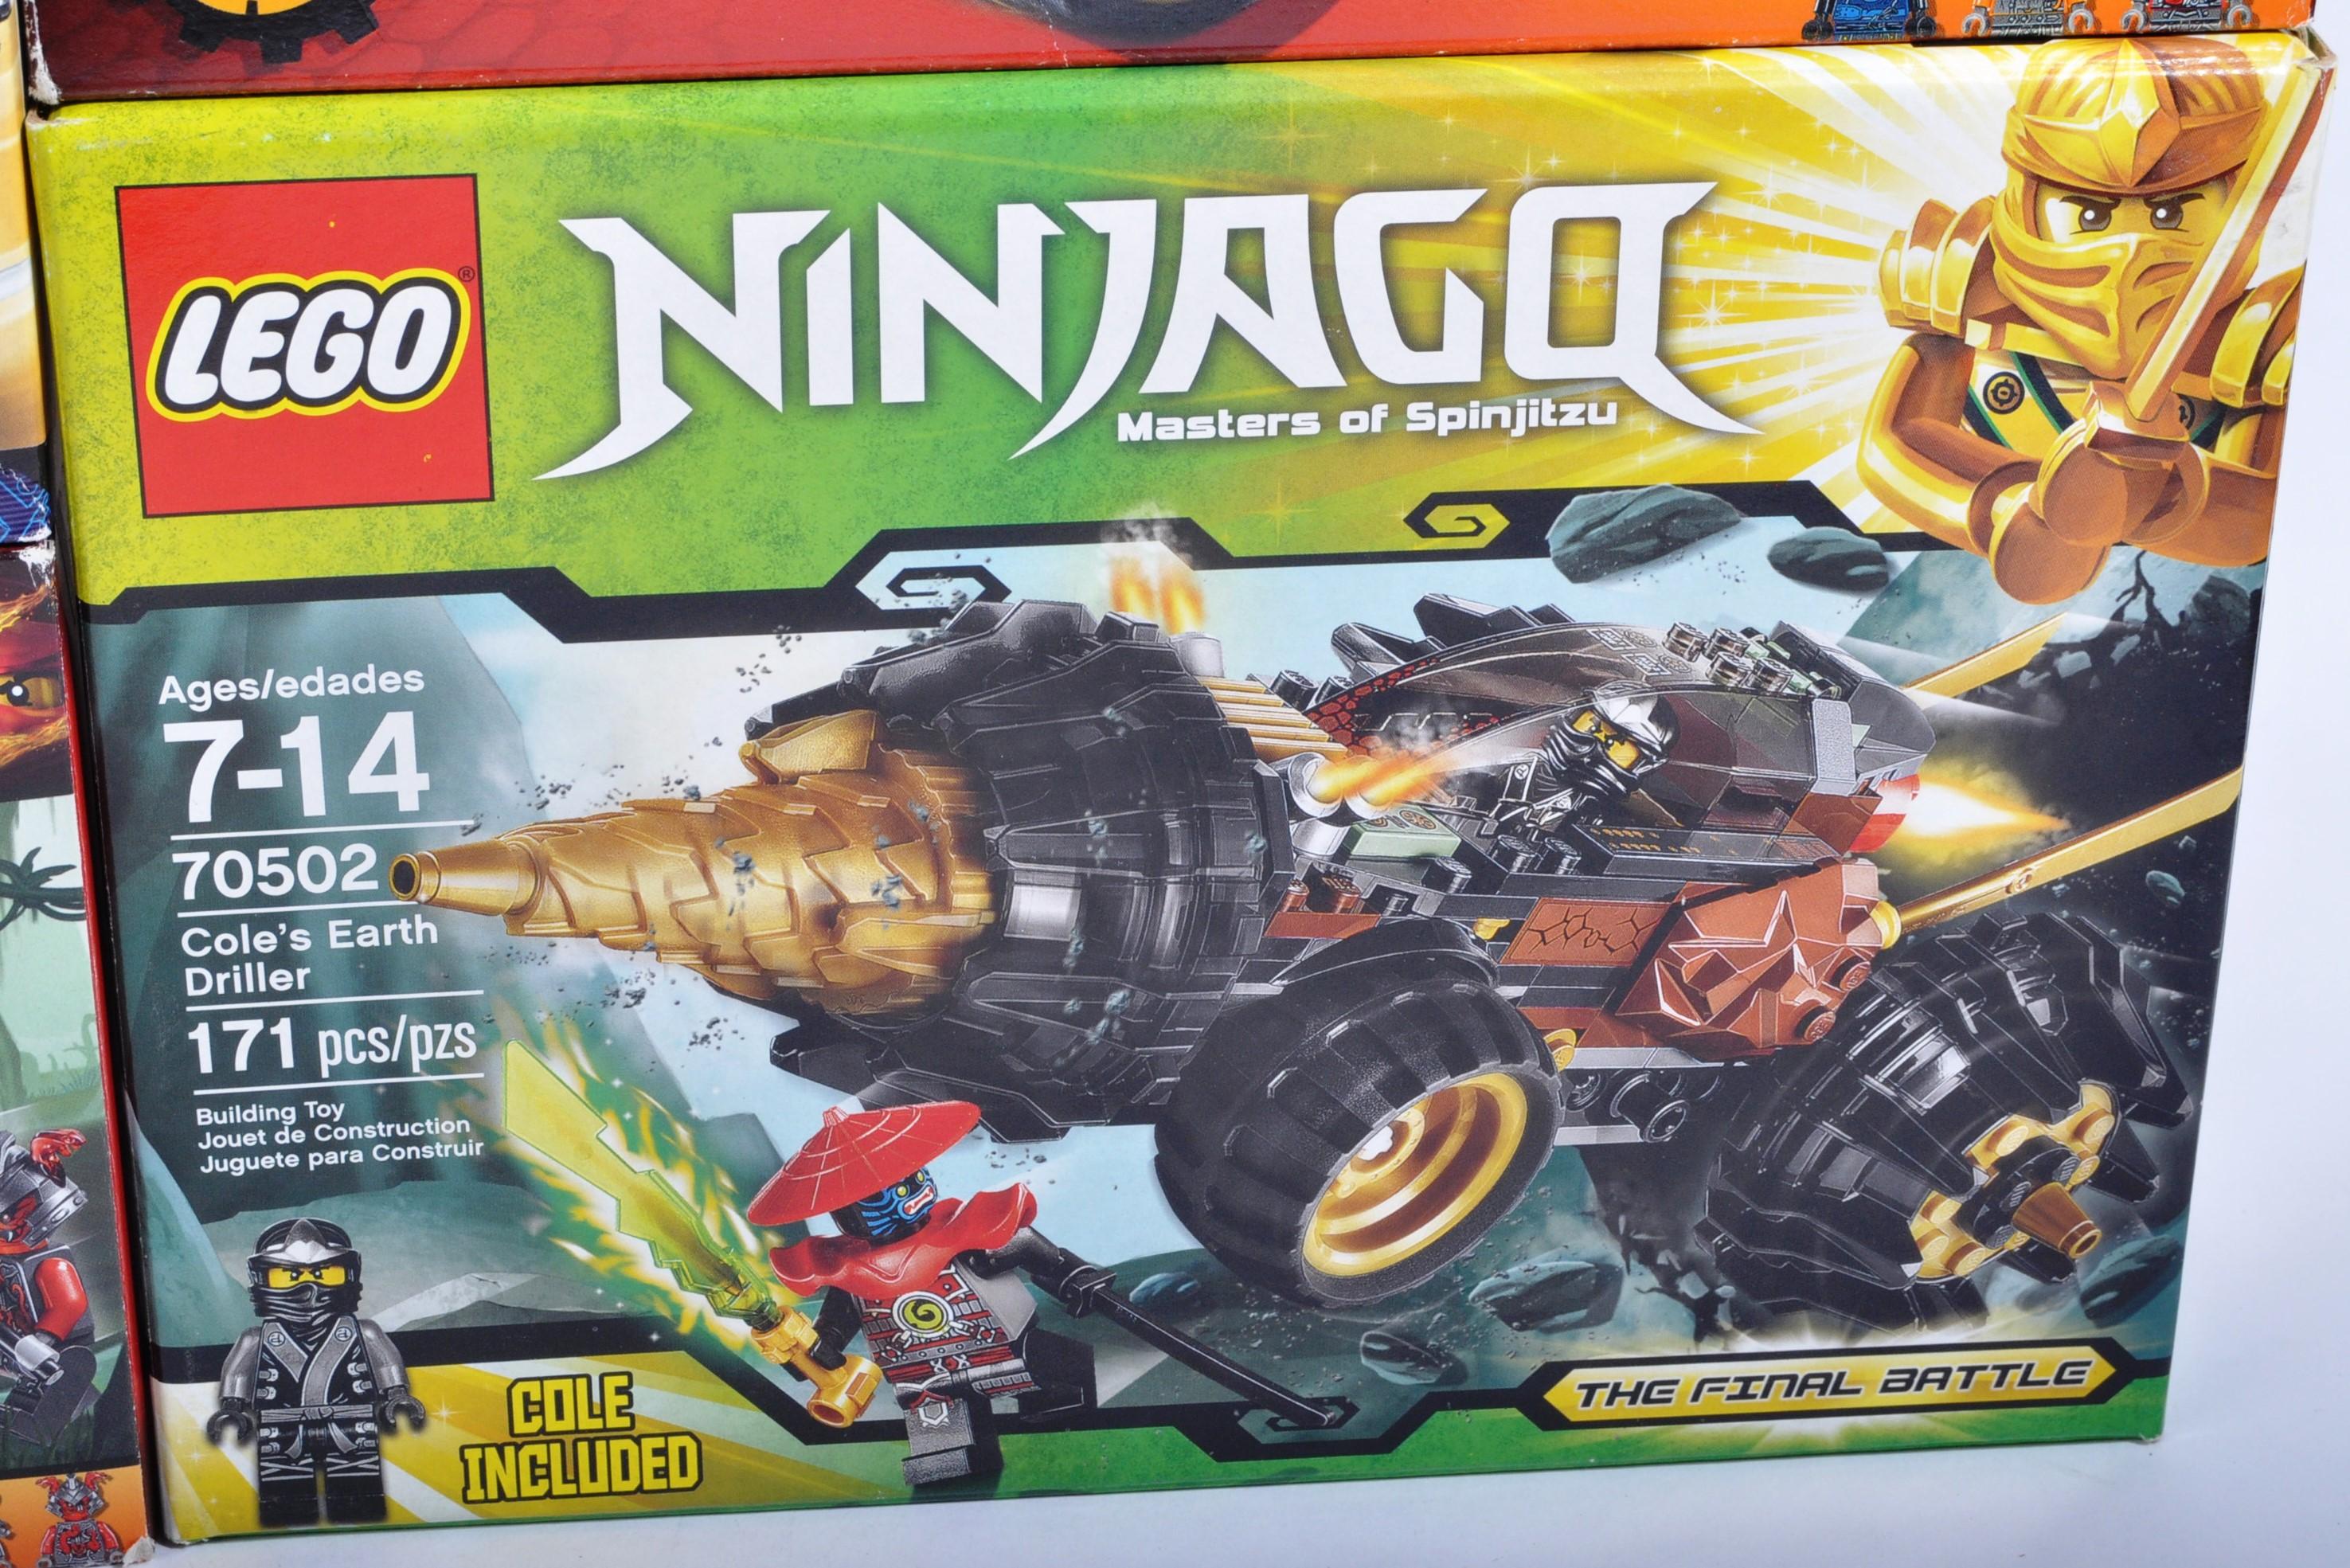 LEGO SETS - LEGO NINJAGO - COLLECTION OF X8 LEGO NINJAGO SETS - Image 9 of 9